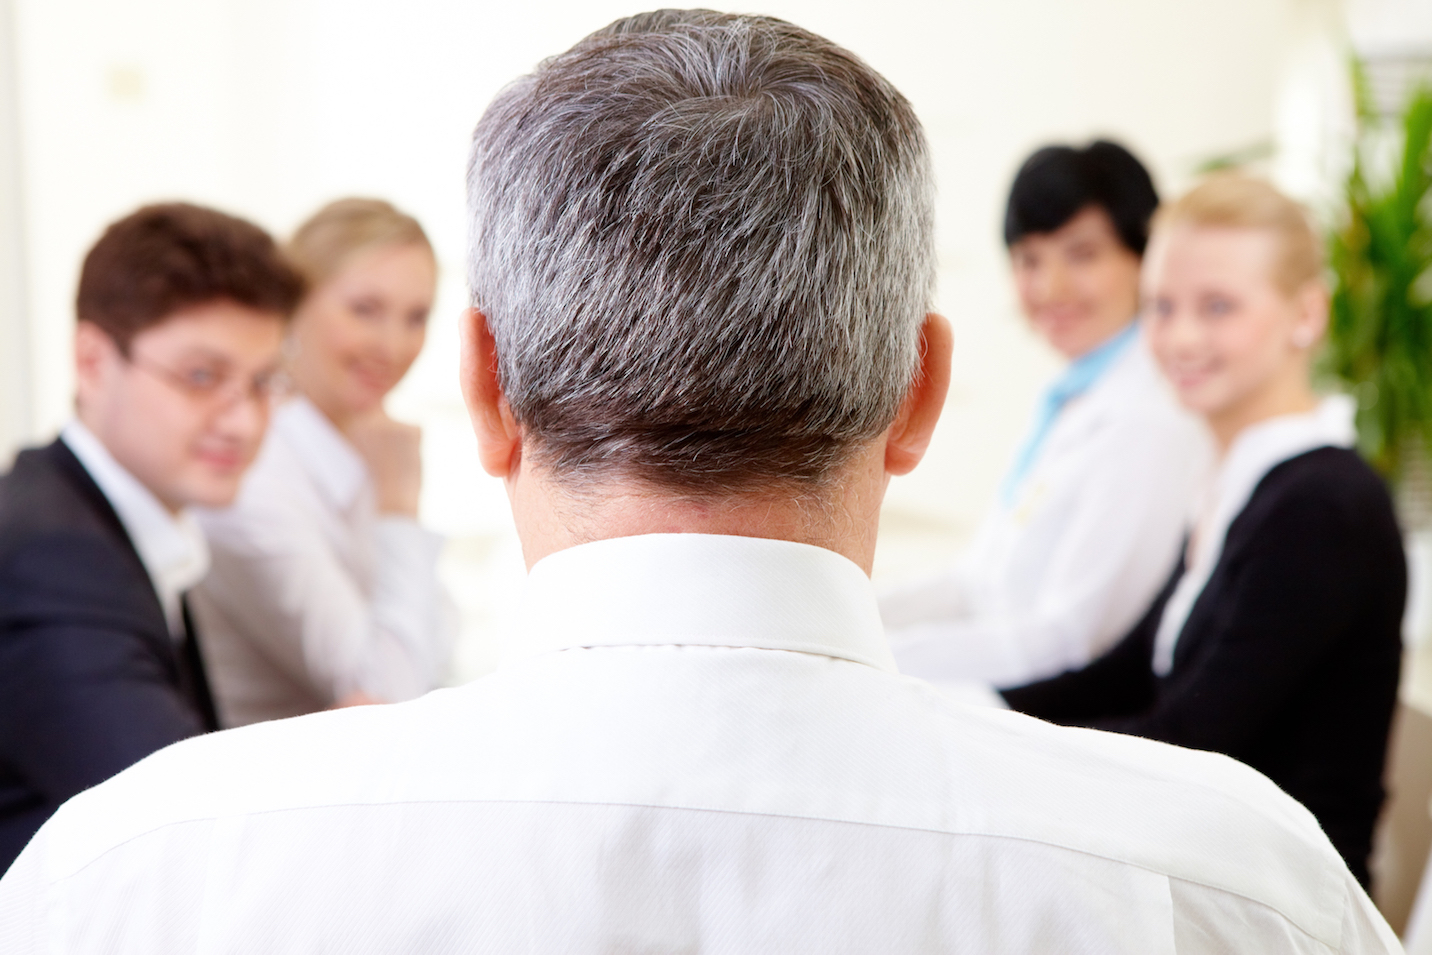 Bullied mature workers – friend or foe?